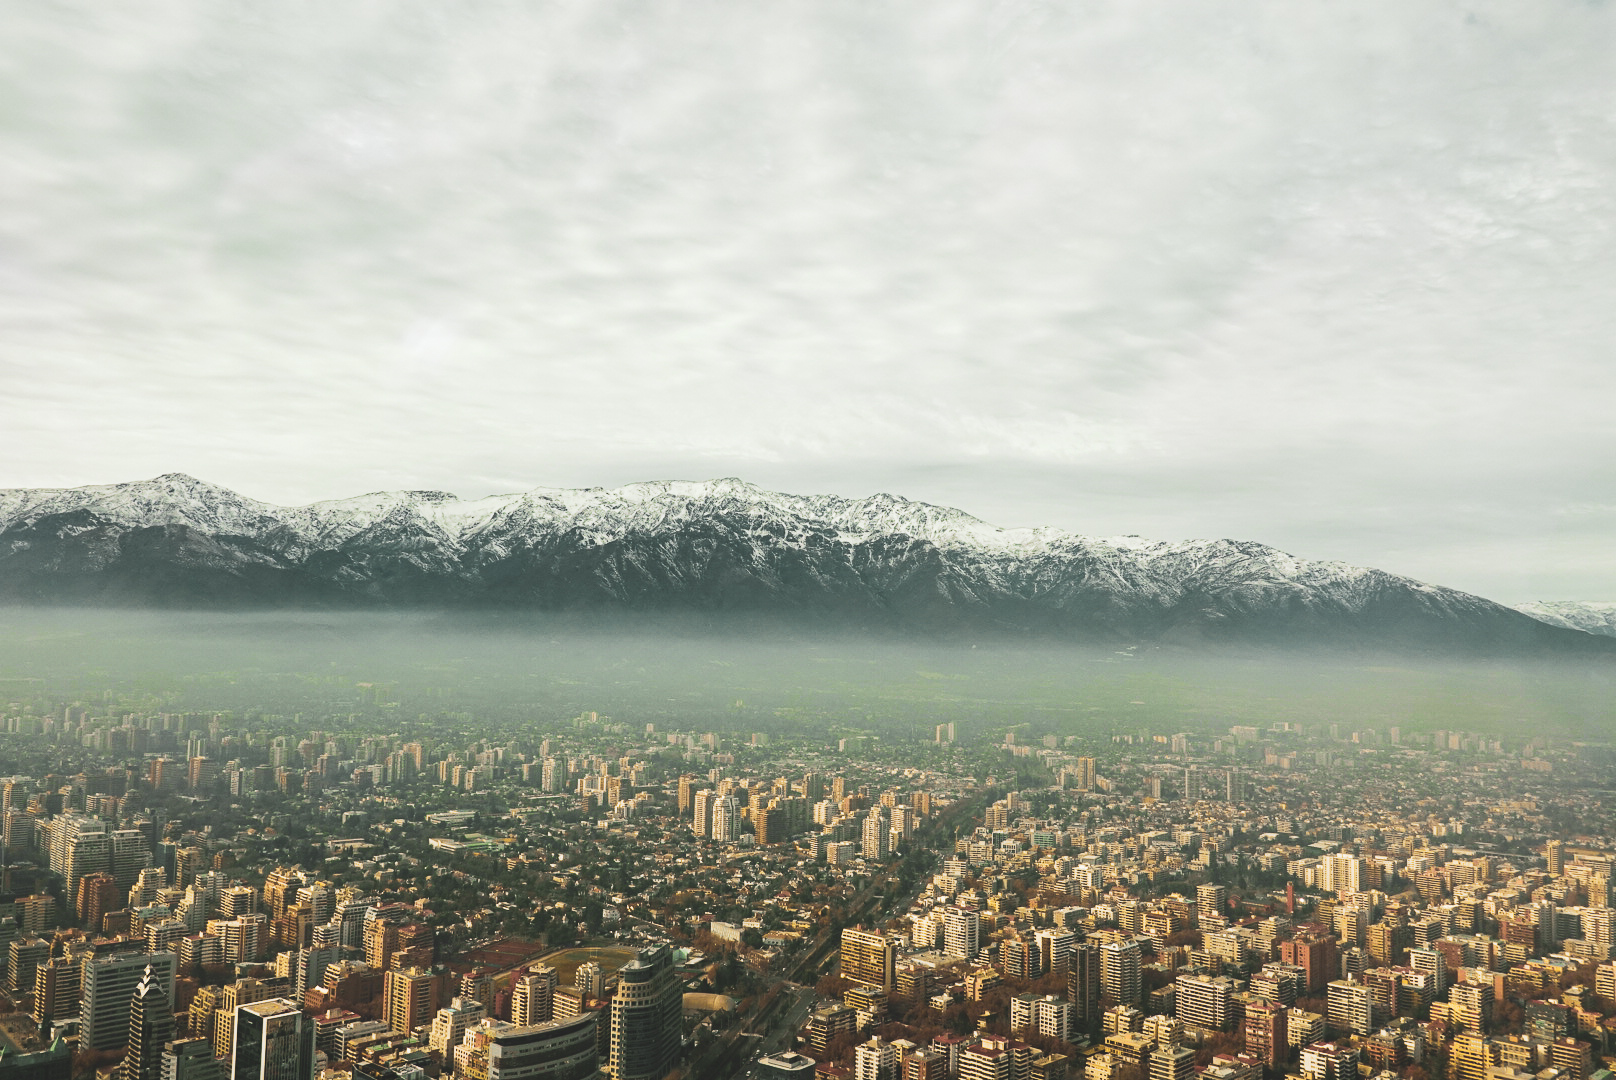 Santiago de Chlie